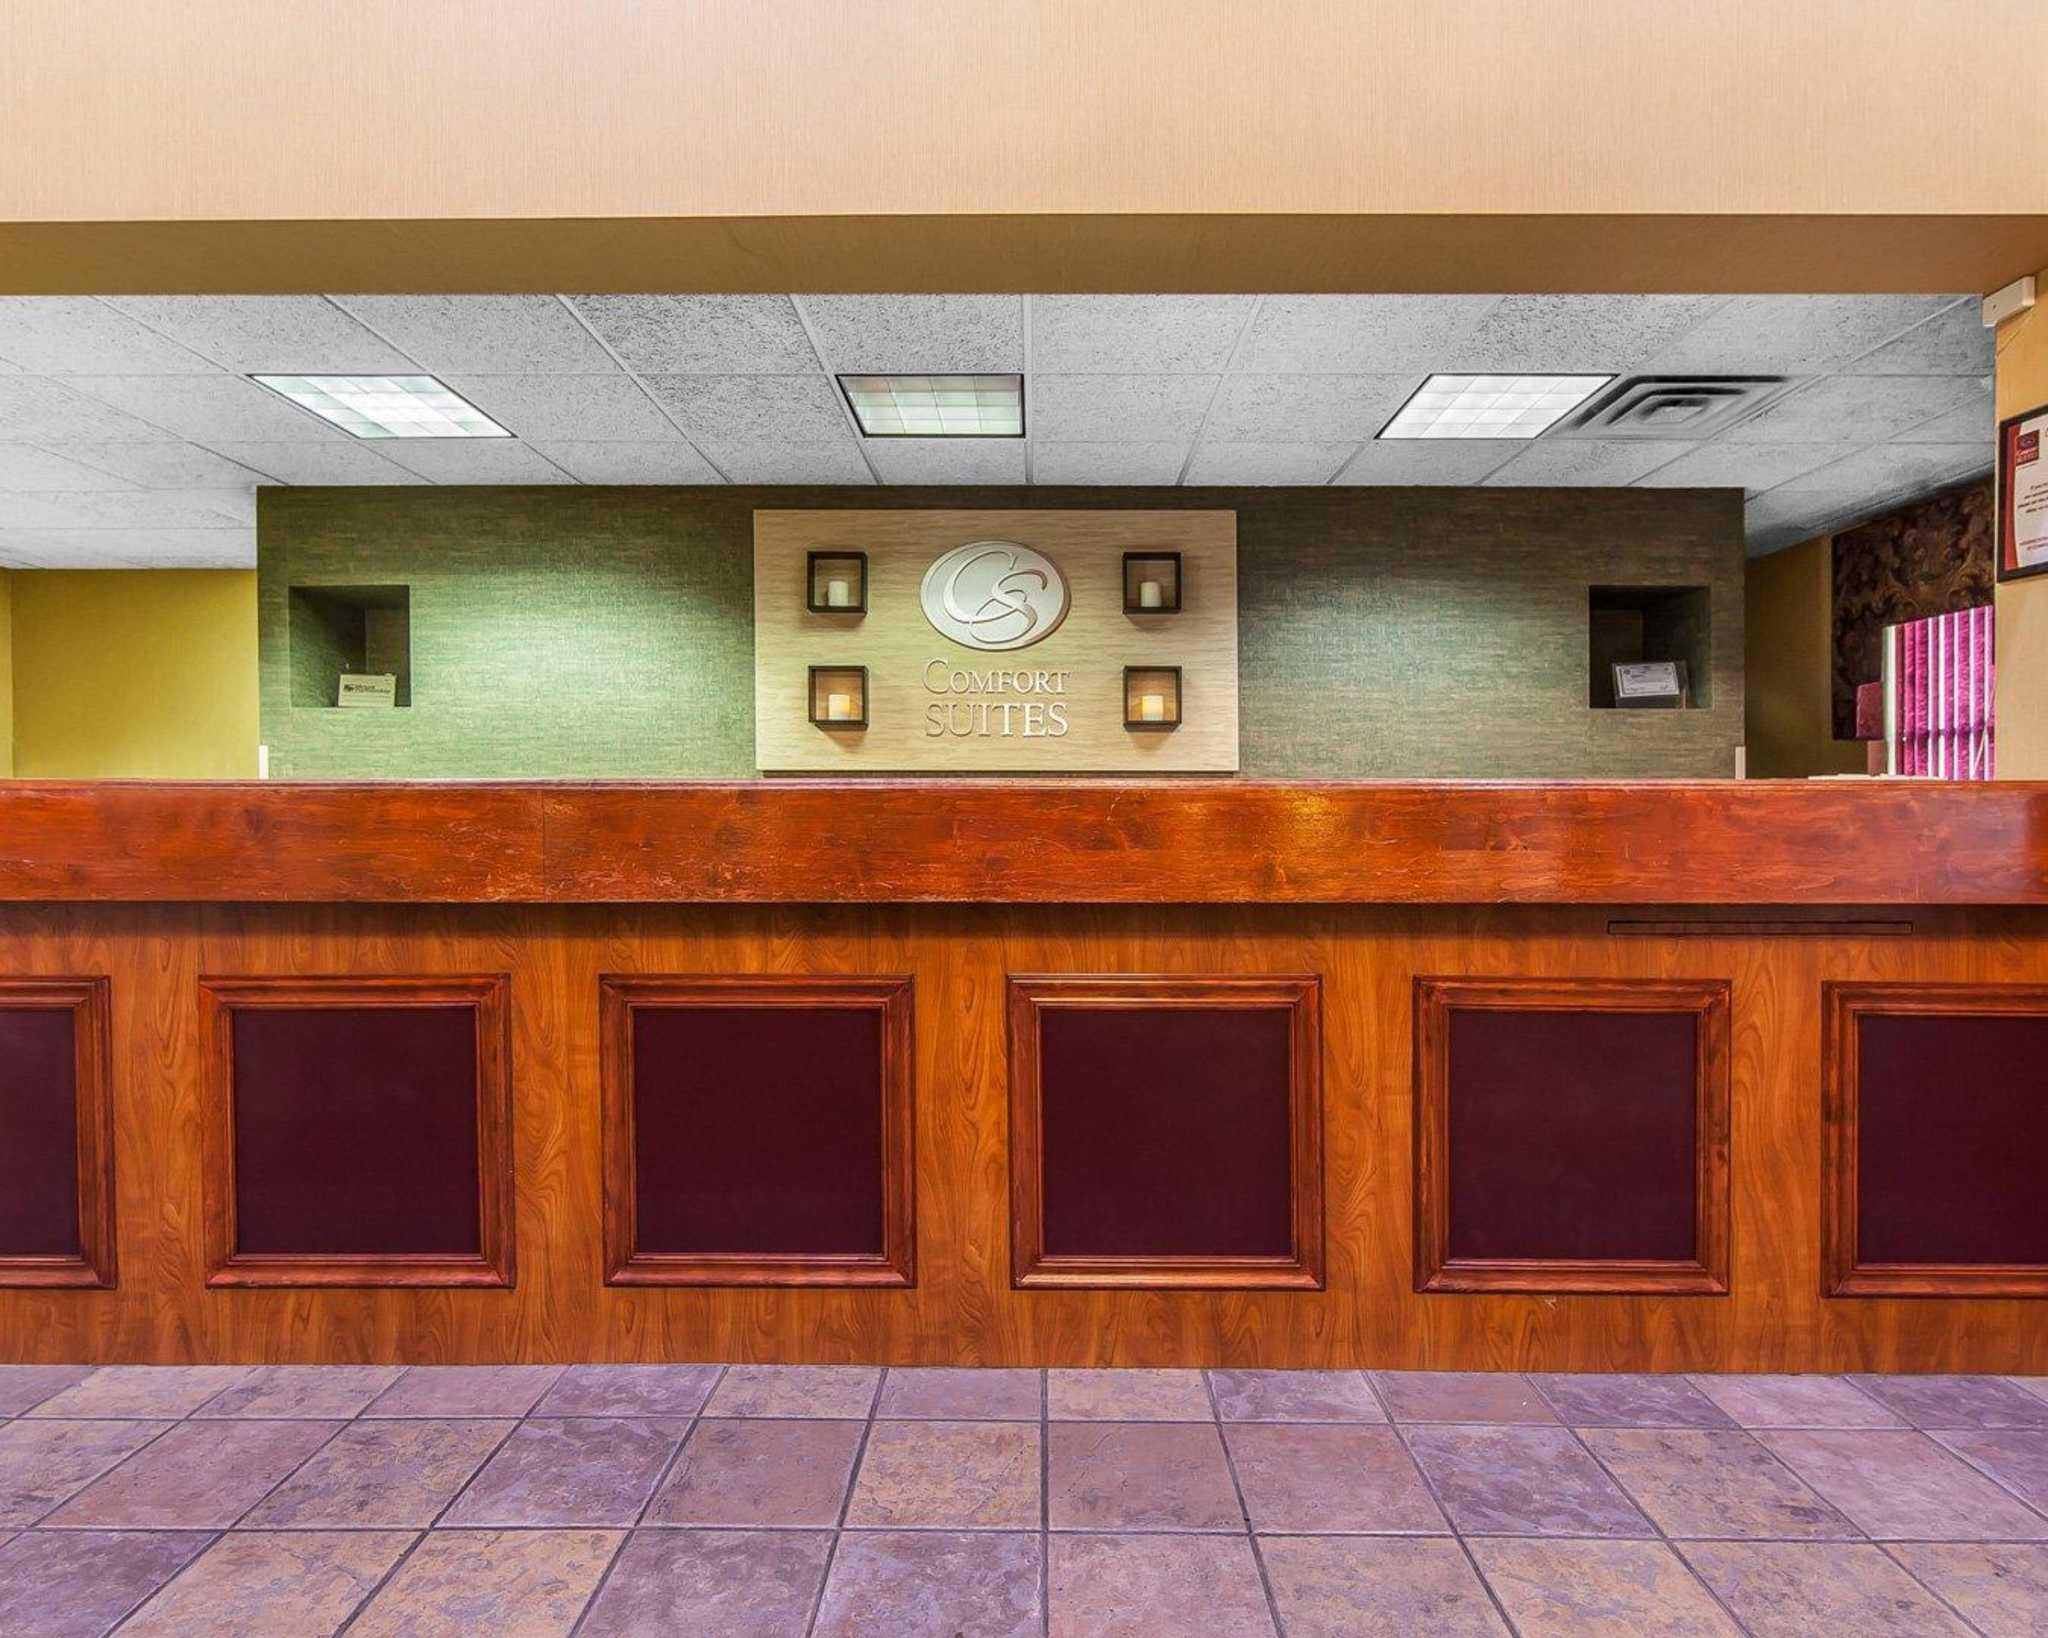 Comfort Suites Airport image 9